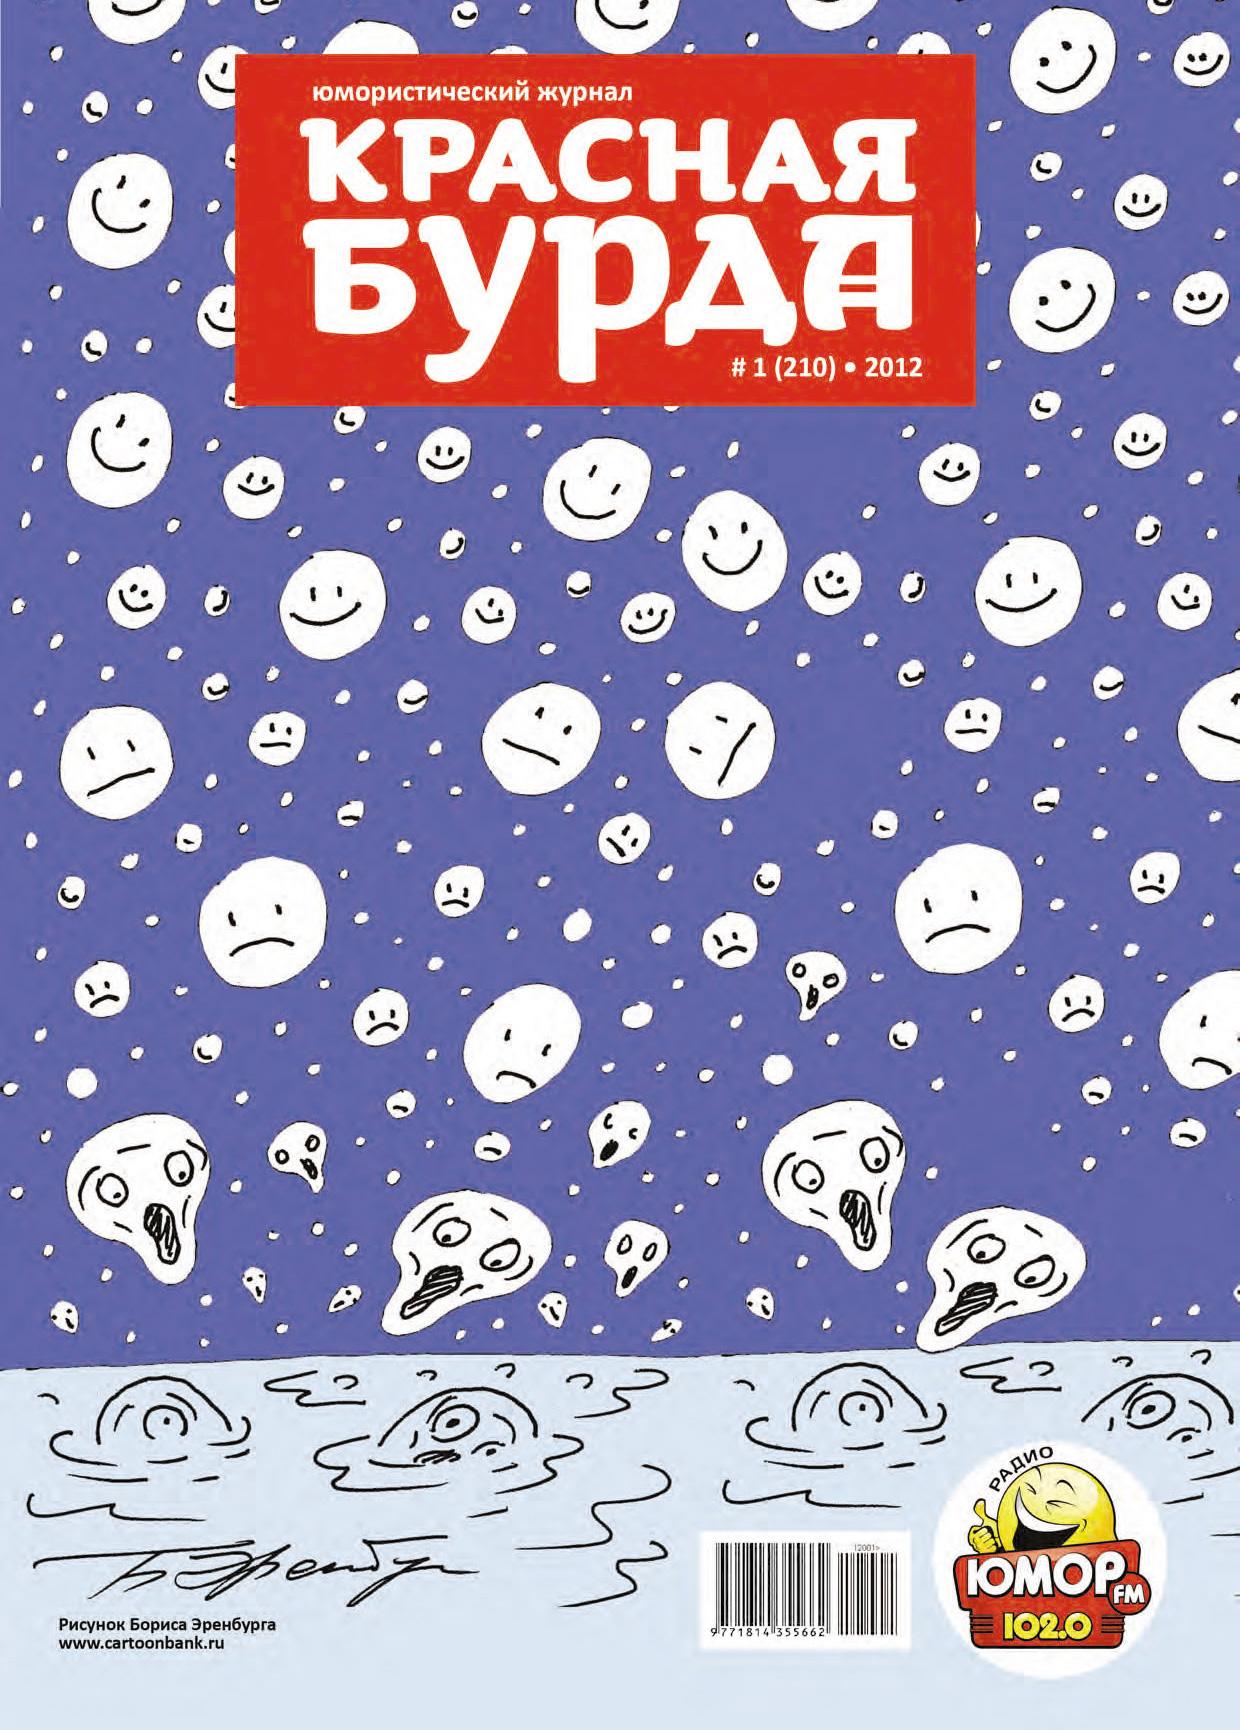 Красная бурда. Юмористический журнал №1 (210) 2012